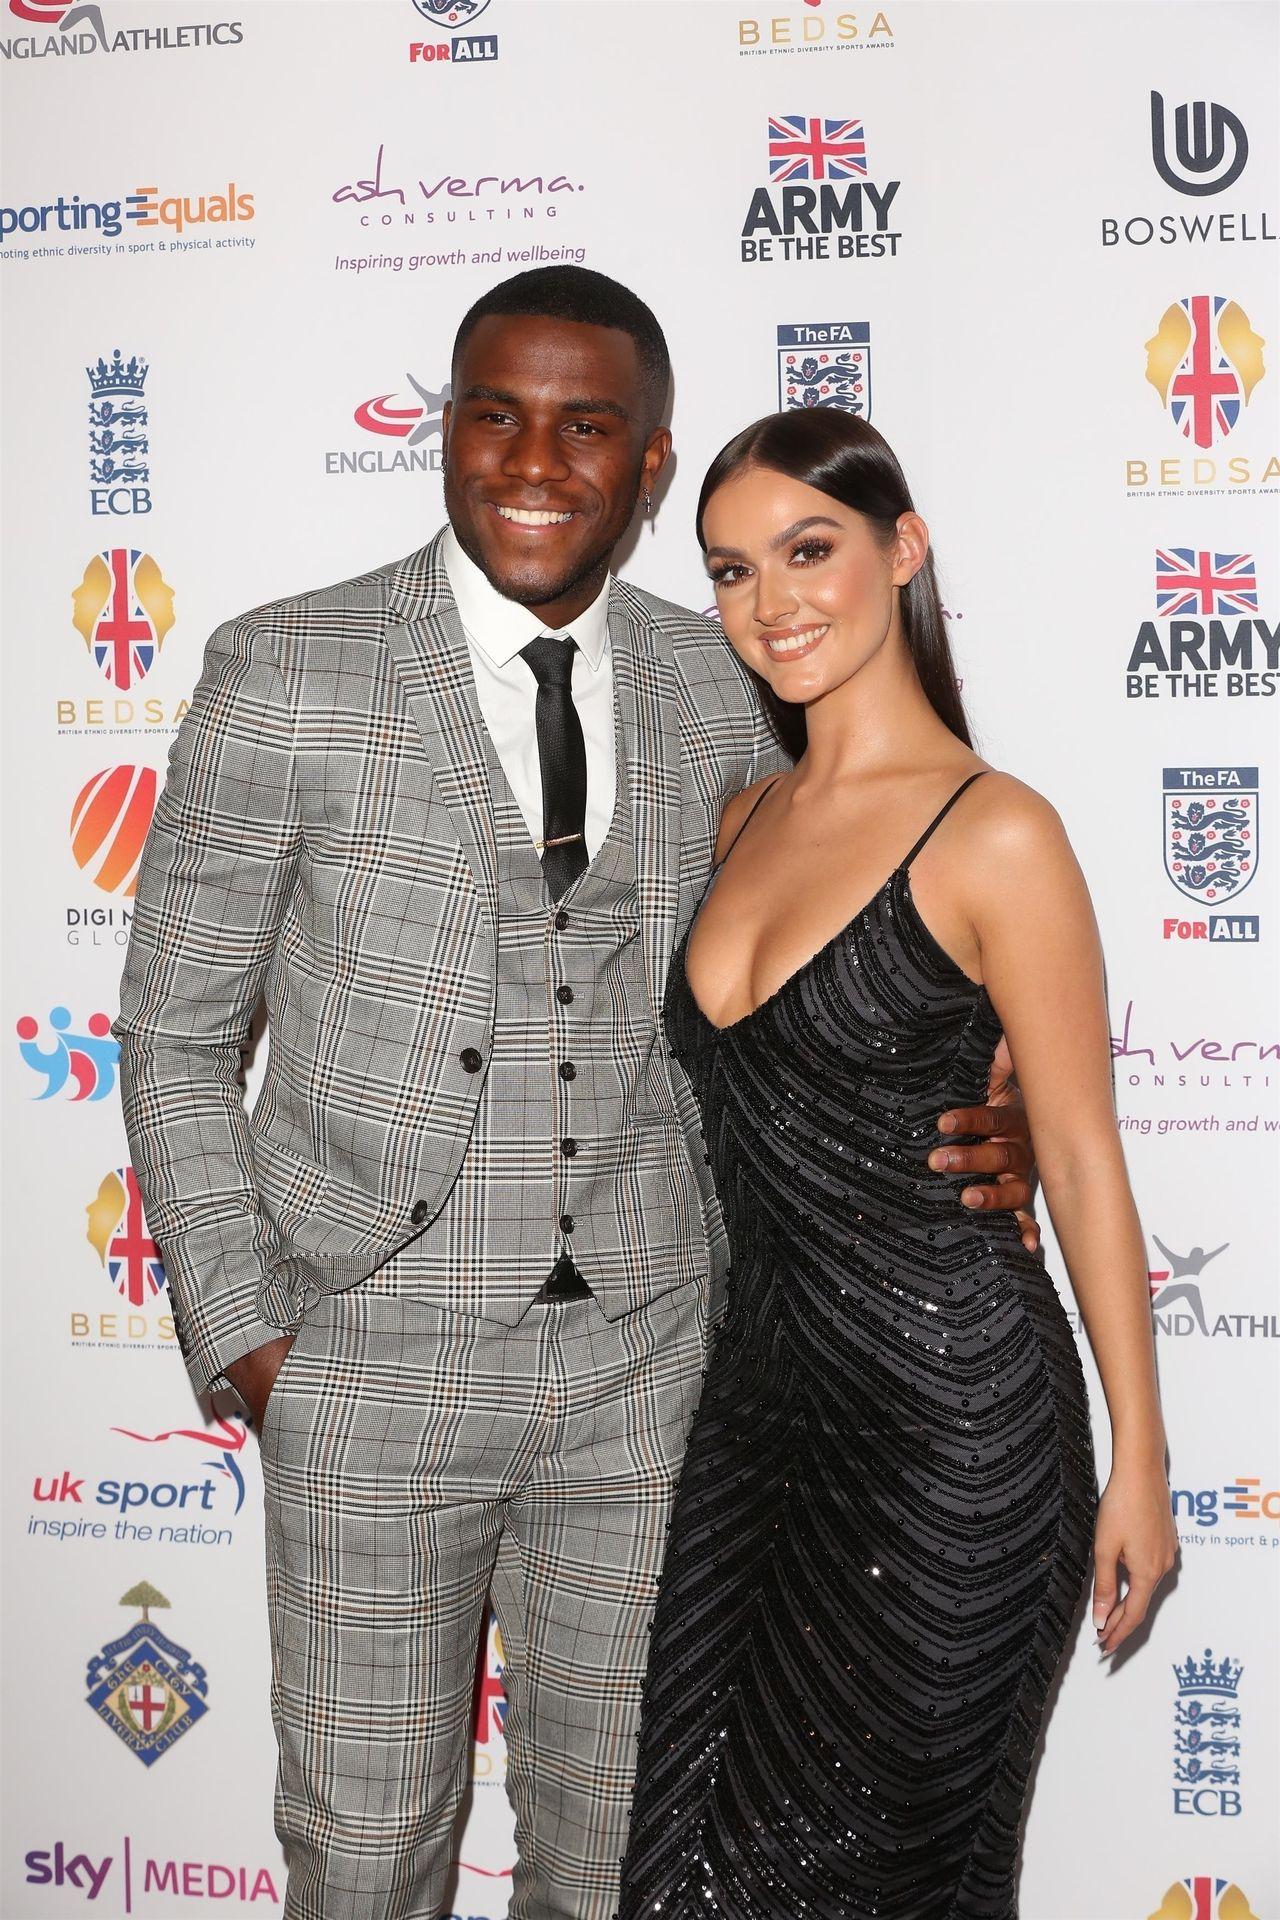 Siannise Fudge & Luke Trotman Are Seen At British Ethnic Diversity Sports Awards 0057